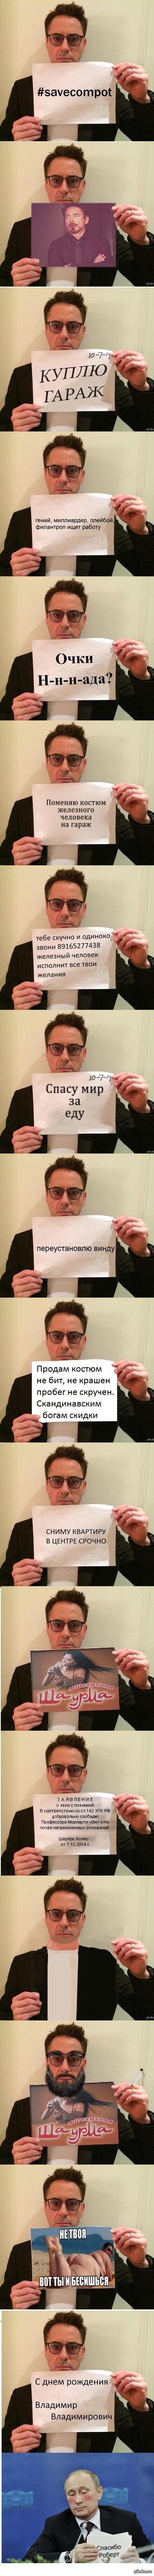 "Много Робертов Дауни младших Из поста <a href=""http://pikabu.ru/story/robert_dauni_ml_zaregalsya_na_reddite_i_sovershil_bolshuyu_oshibku_2723567"">http://pikabu.ru/story/_2723567</a>"